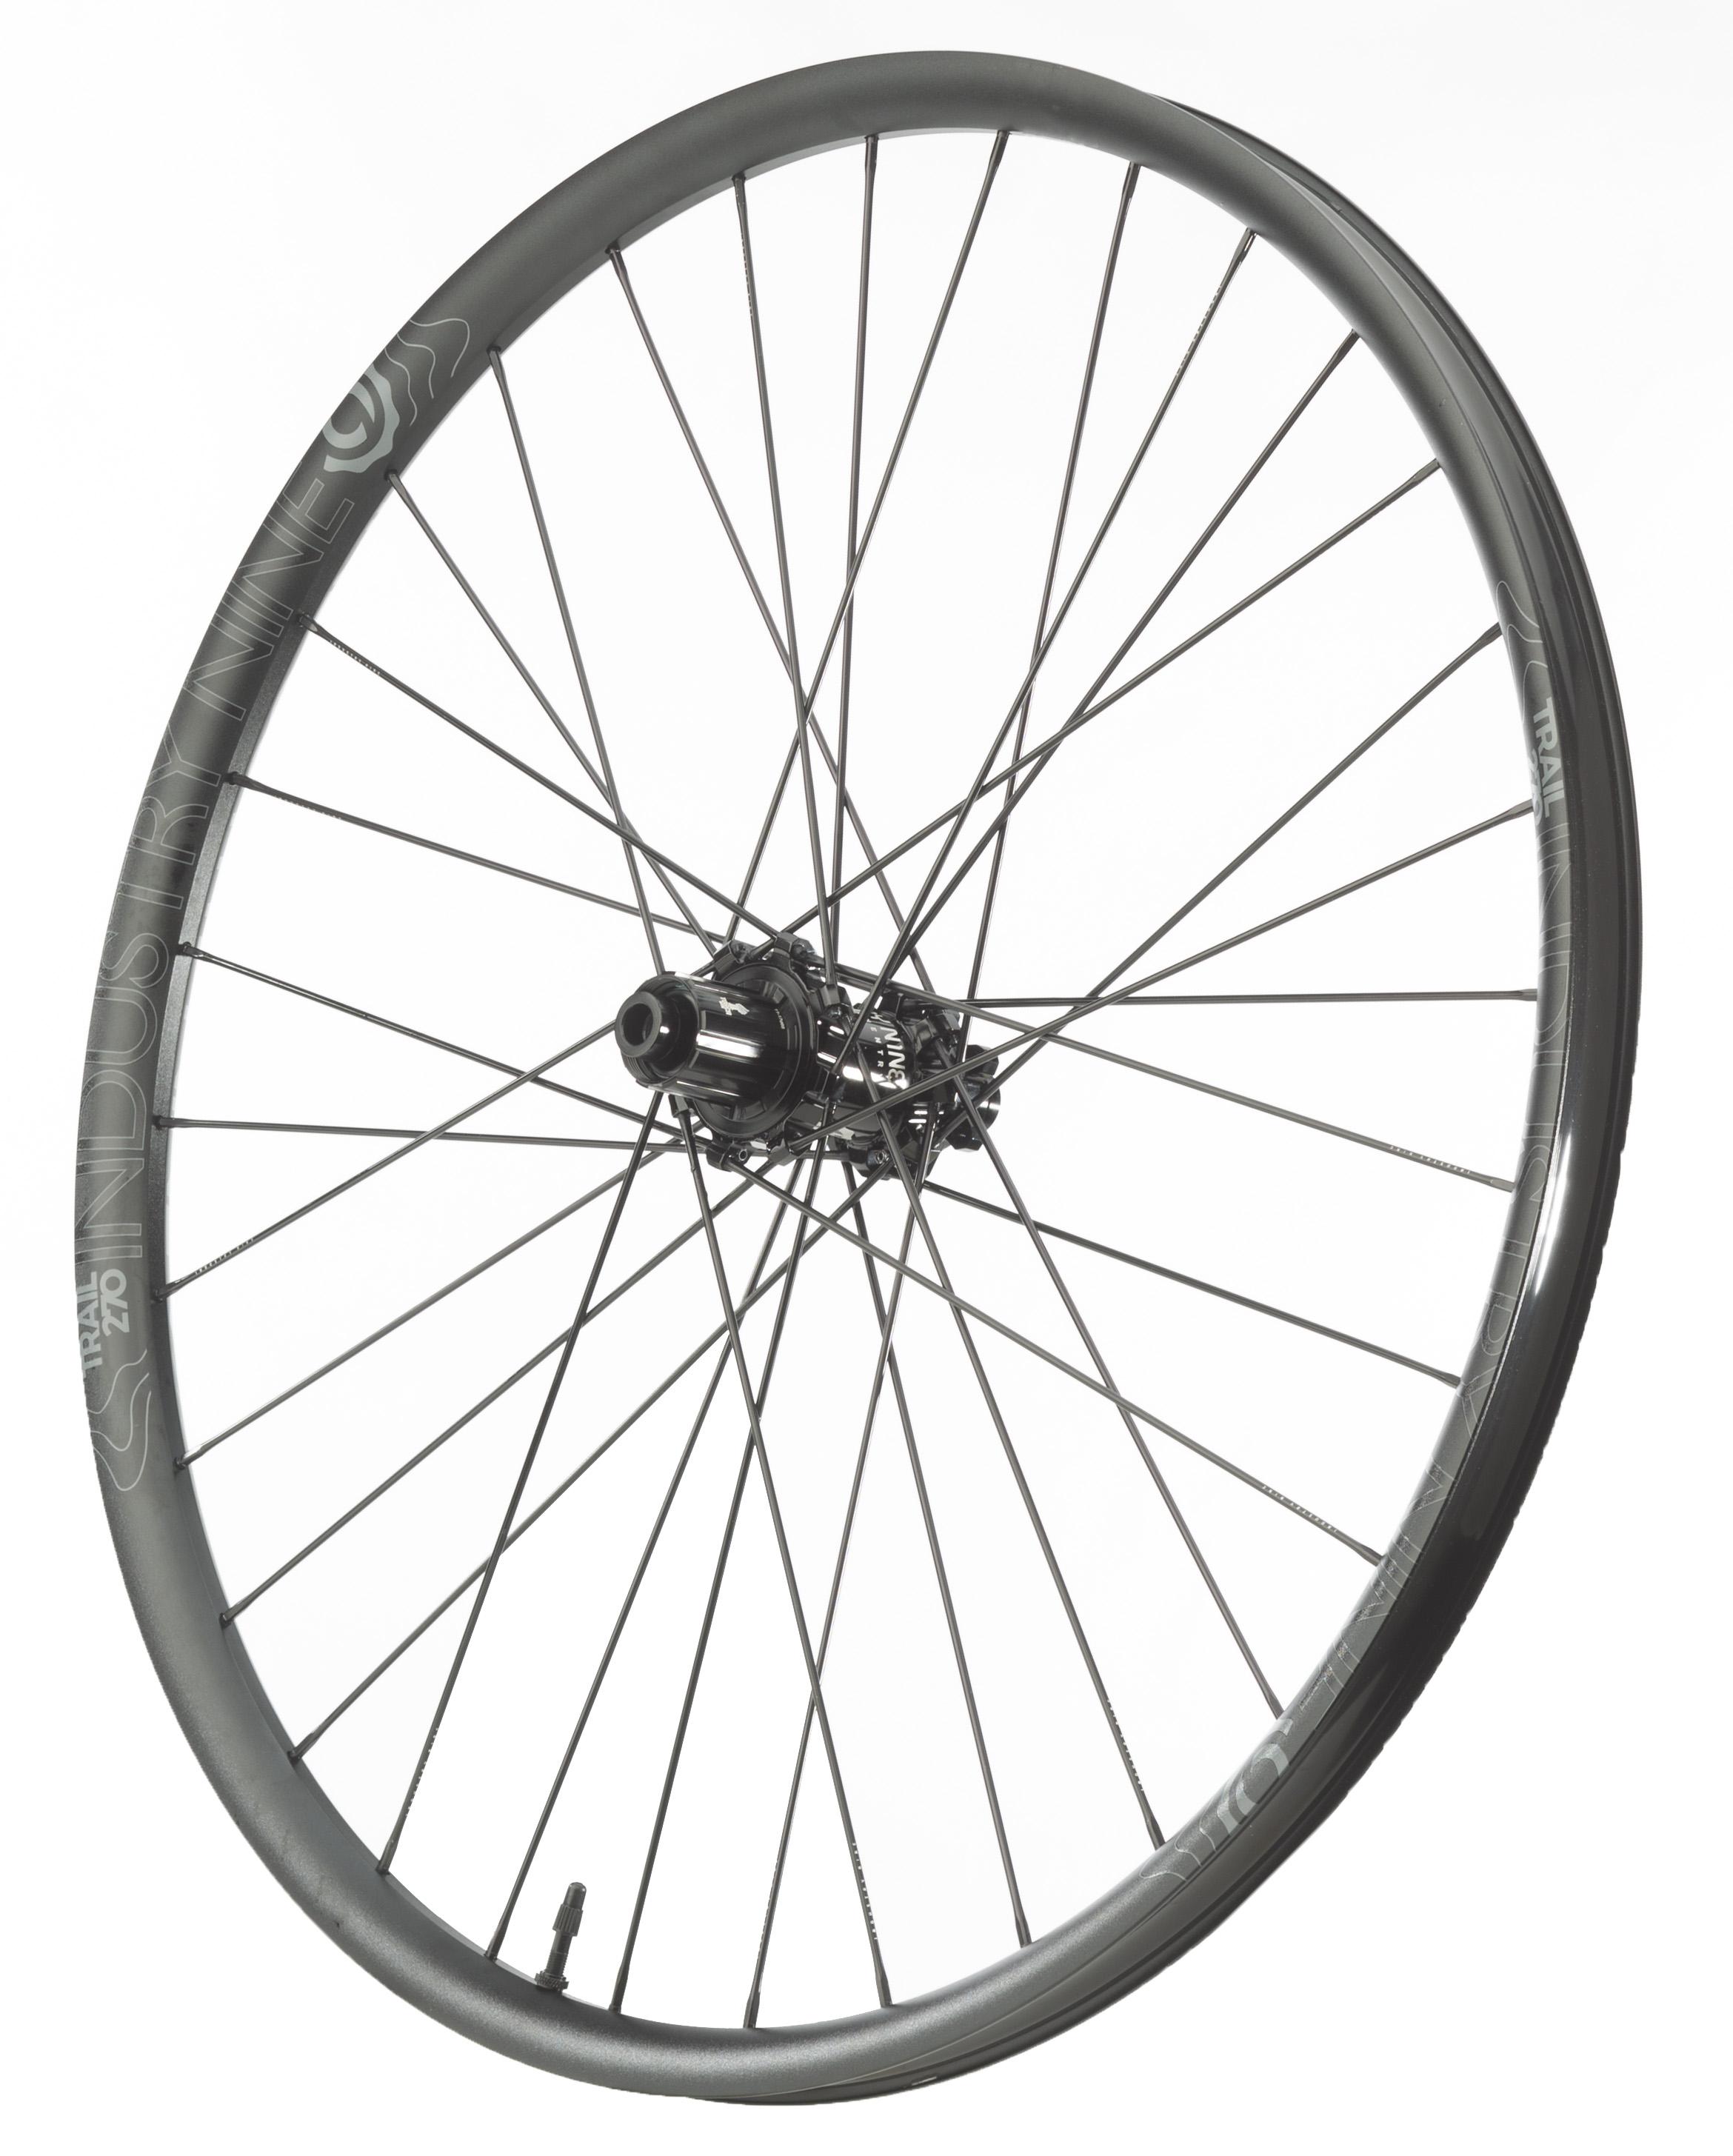 "Industry Nine Trail 270 29"" 32H Torch Wheels"